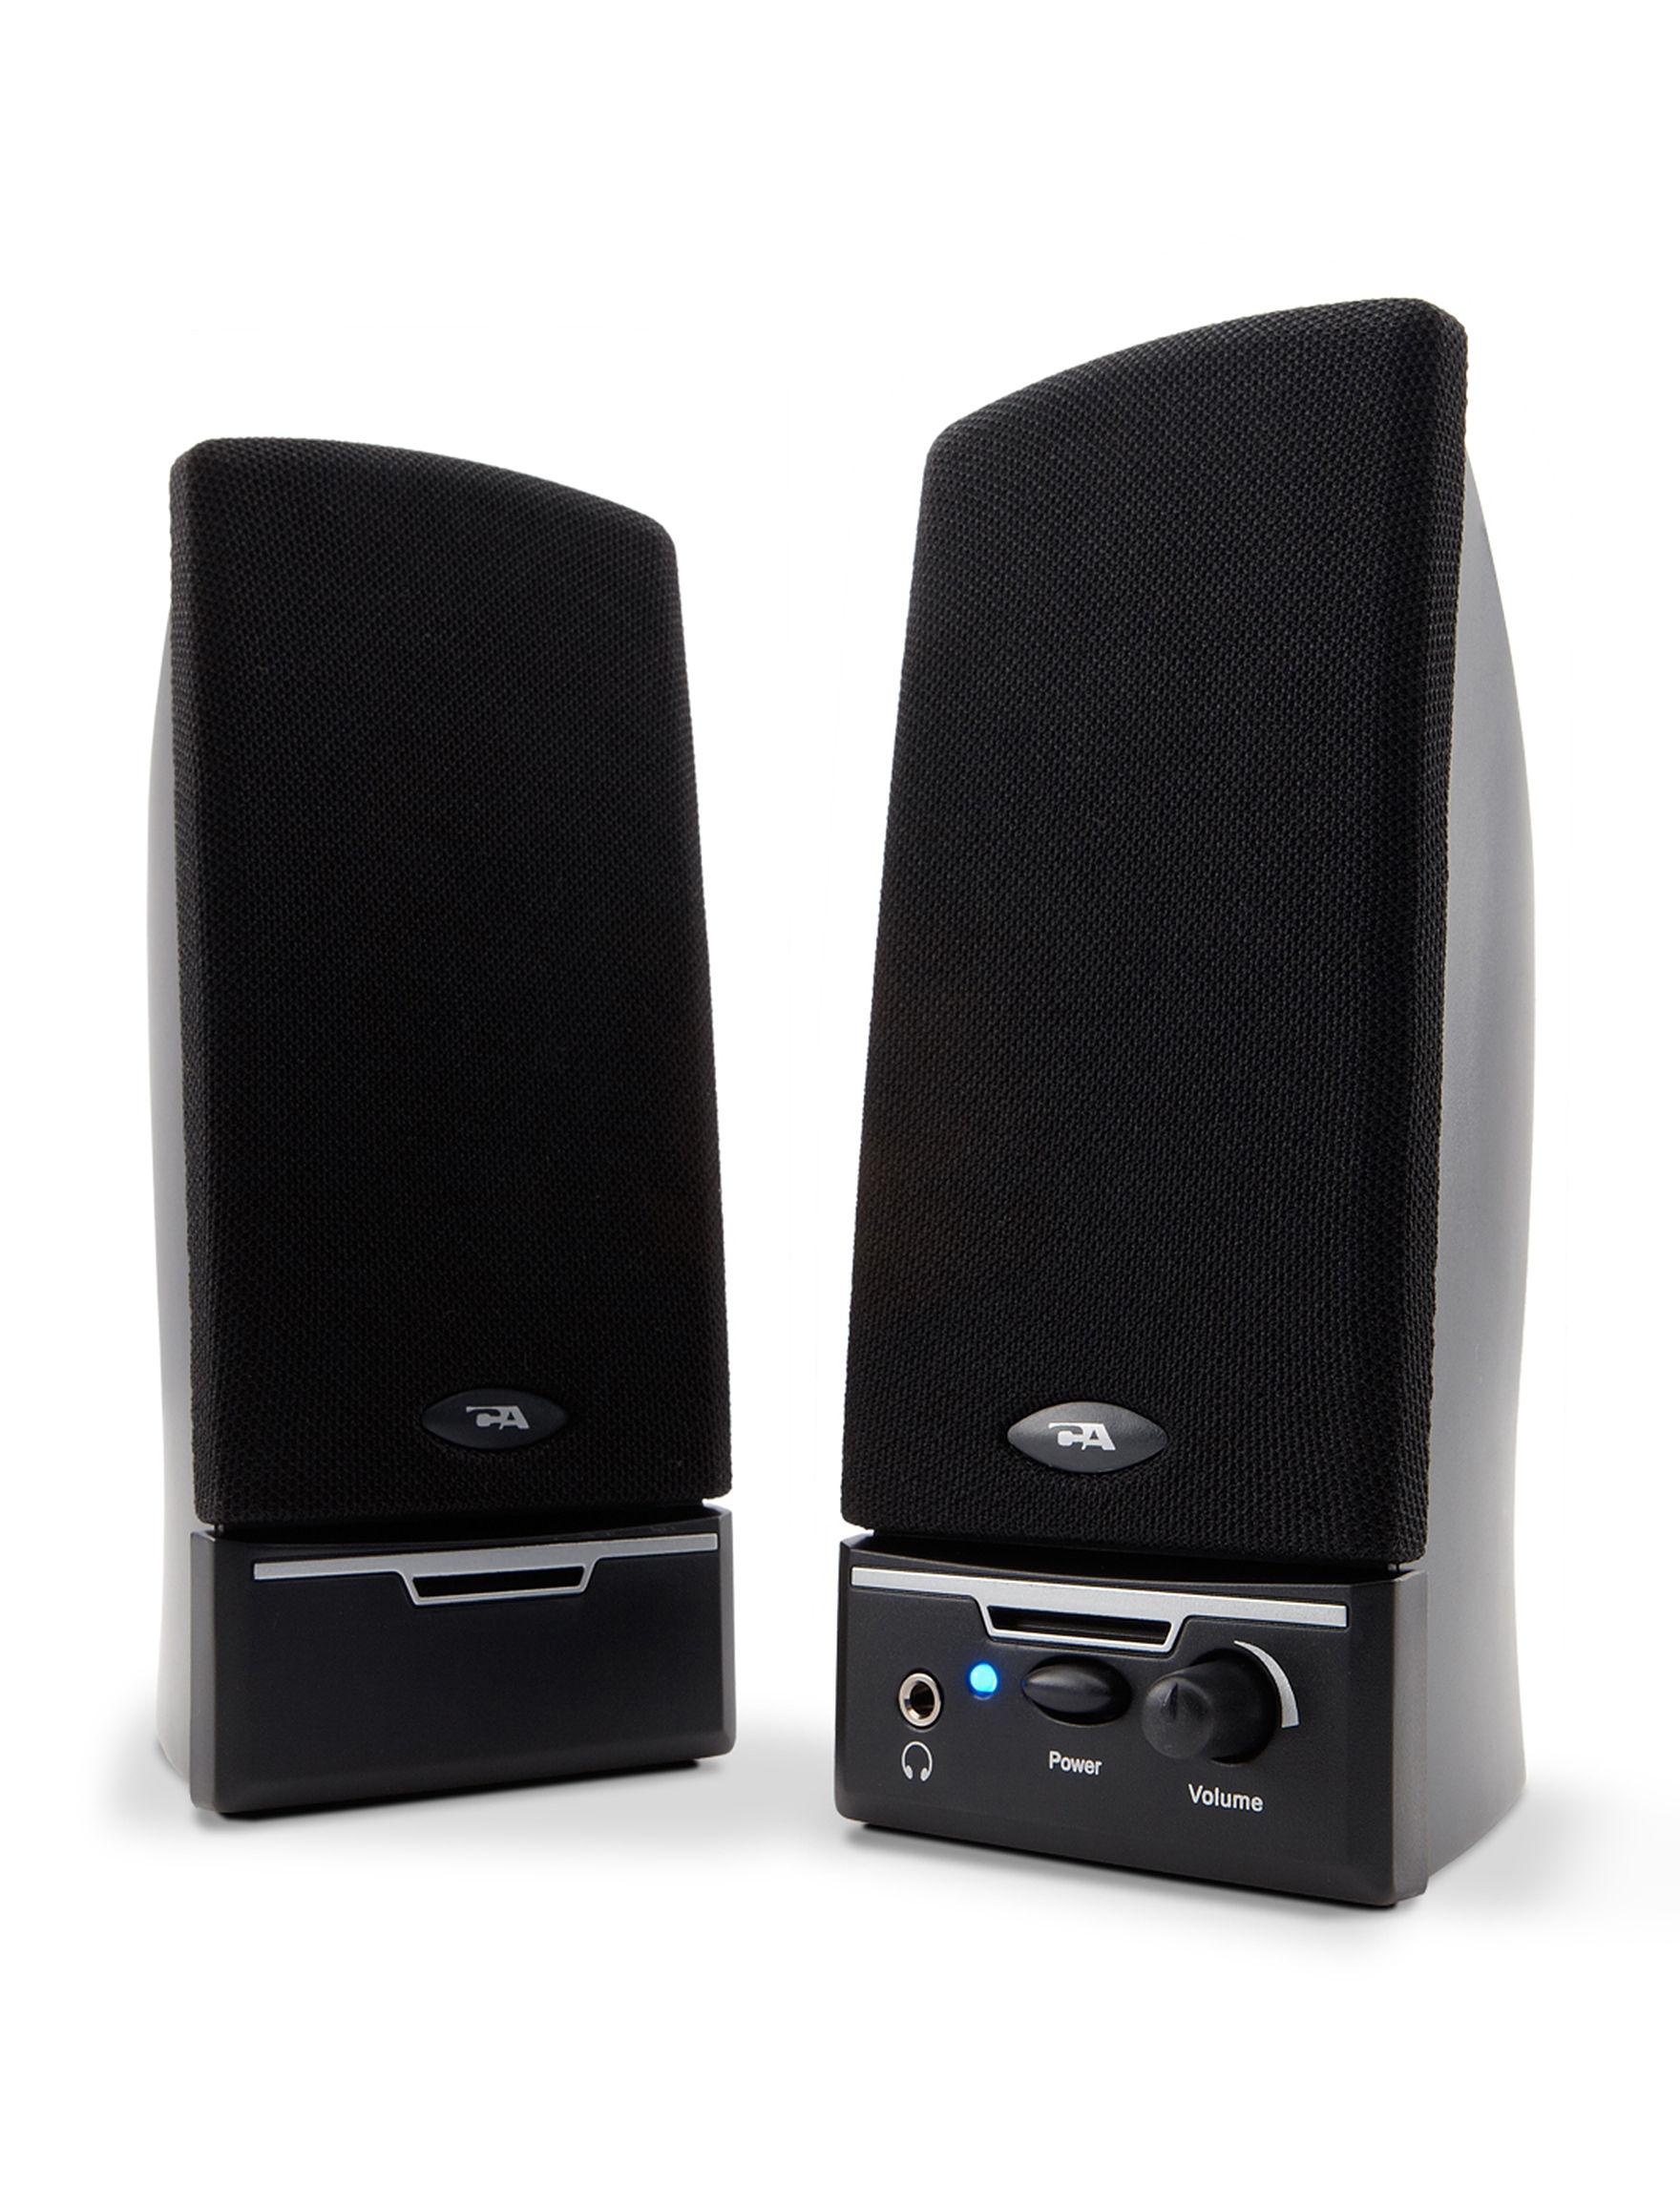 Cyber Acoustics Black Speakers & Docks Home & Portable Audio TV & Home Theater